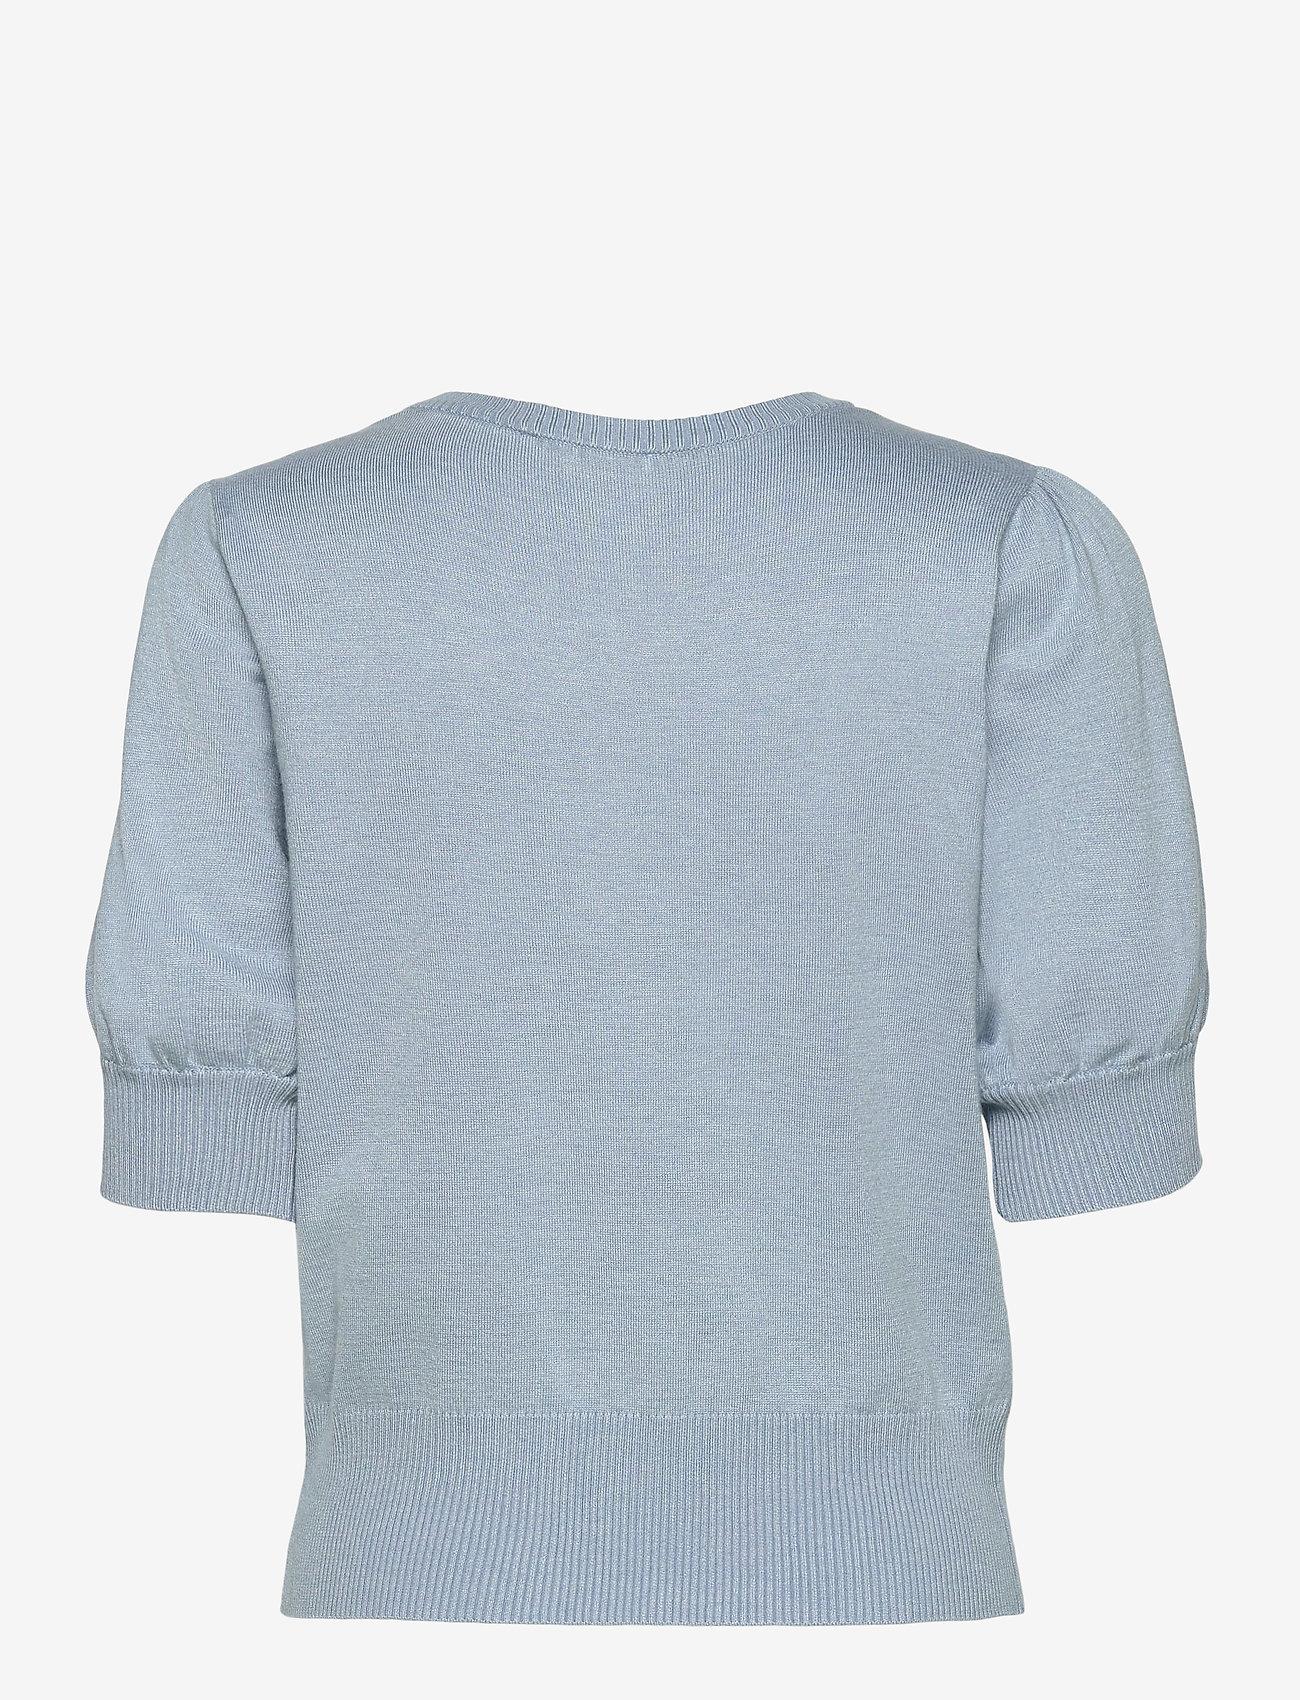 Minus - Liva knit tee - strikkede toppe - dusty blue melange - 1